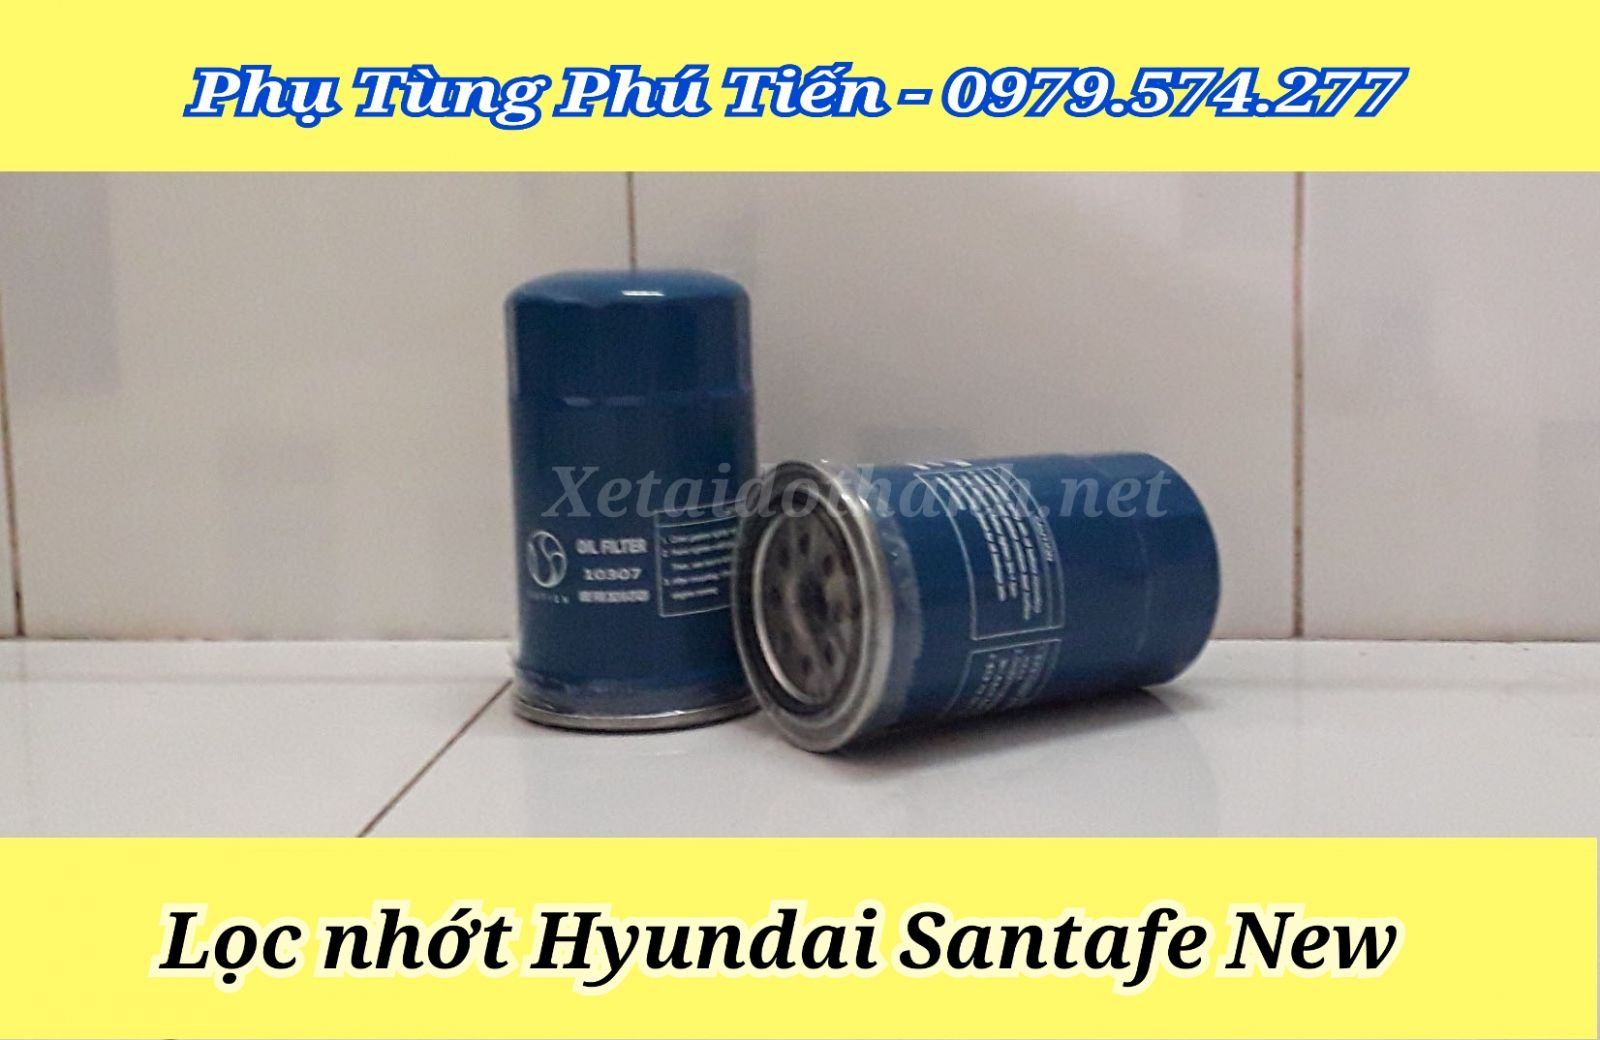 Lọc nhớt xe Hyundai Santafe New